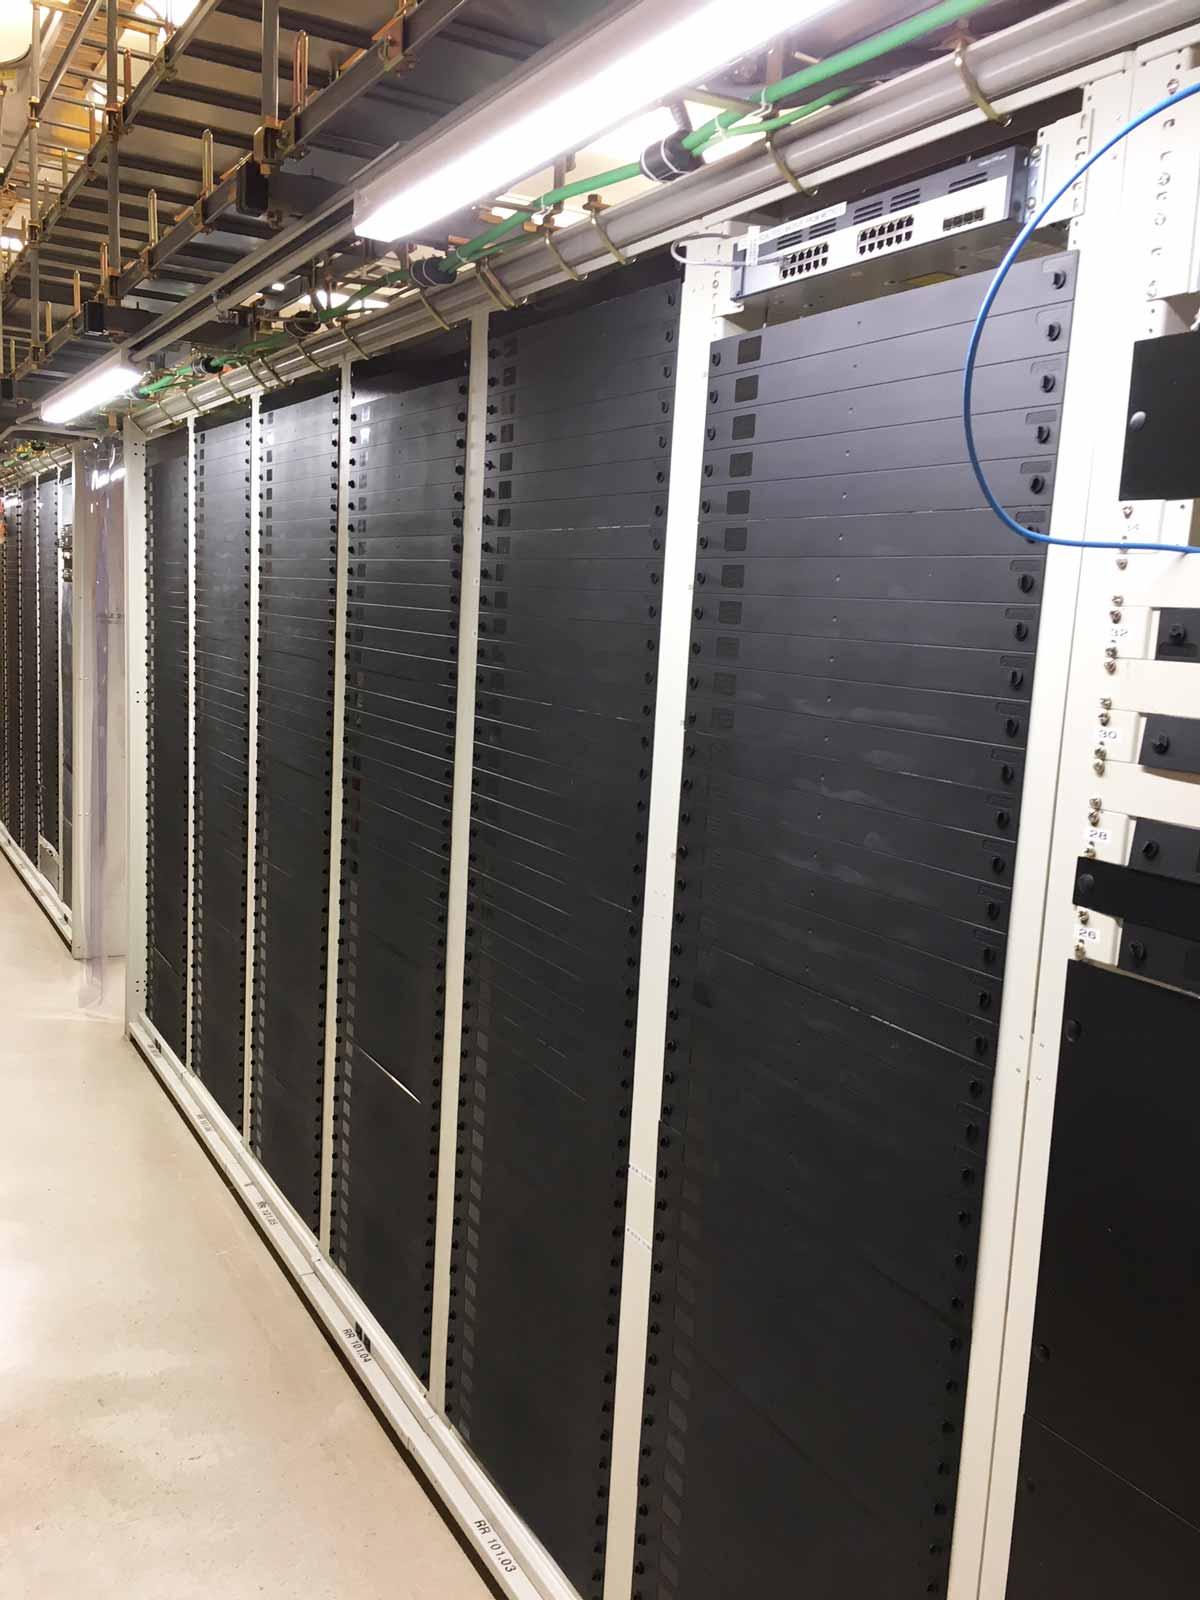 EZ-Blank-Blanking-Panels